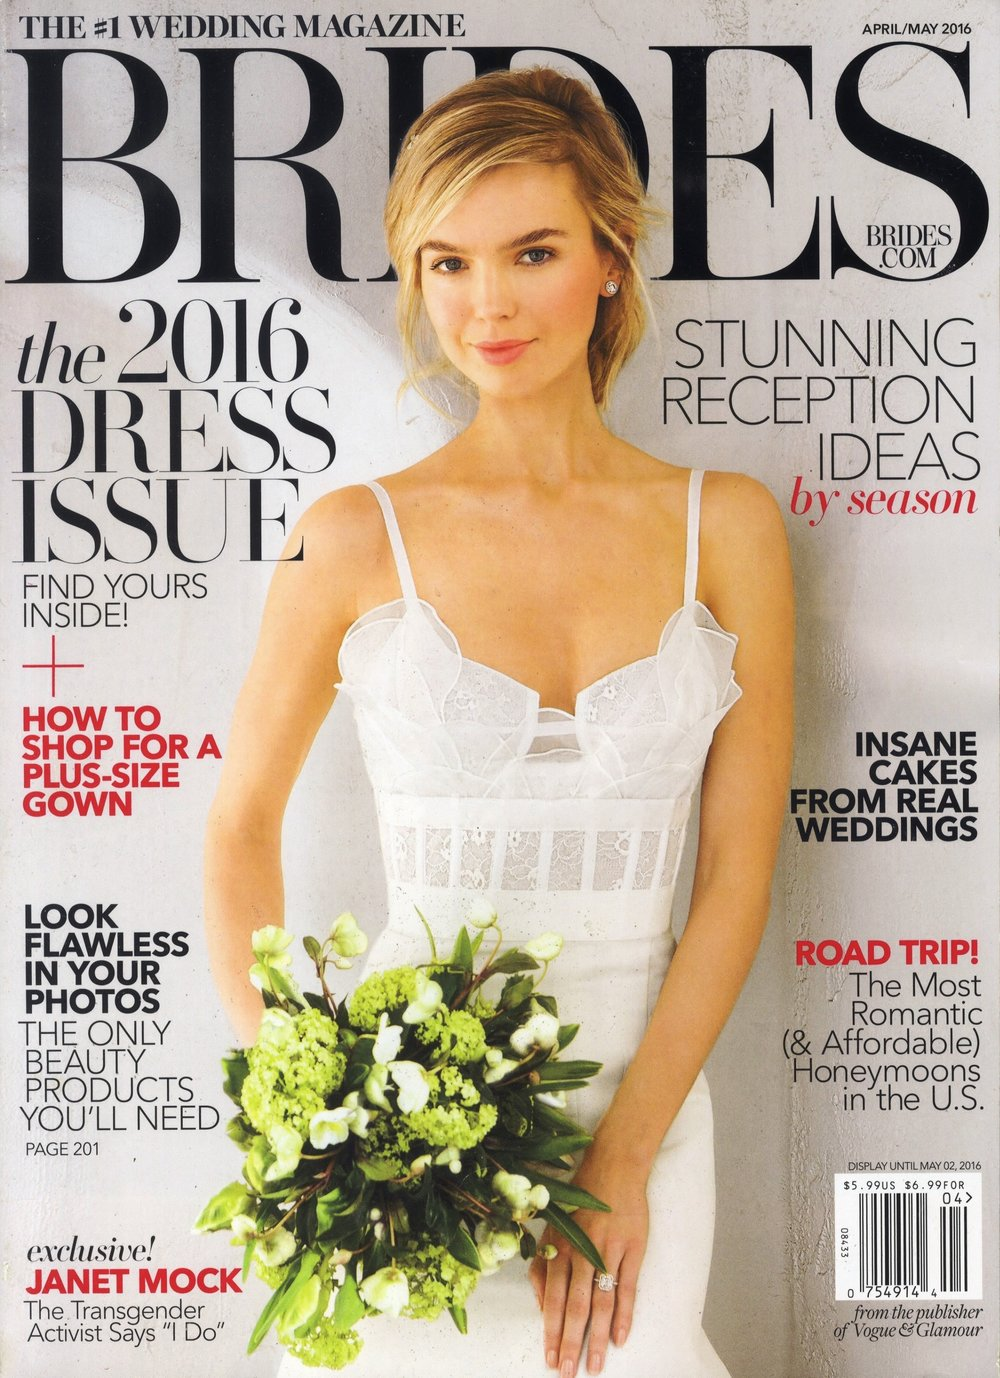 Cover Brides.jpg